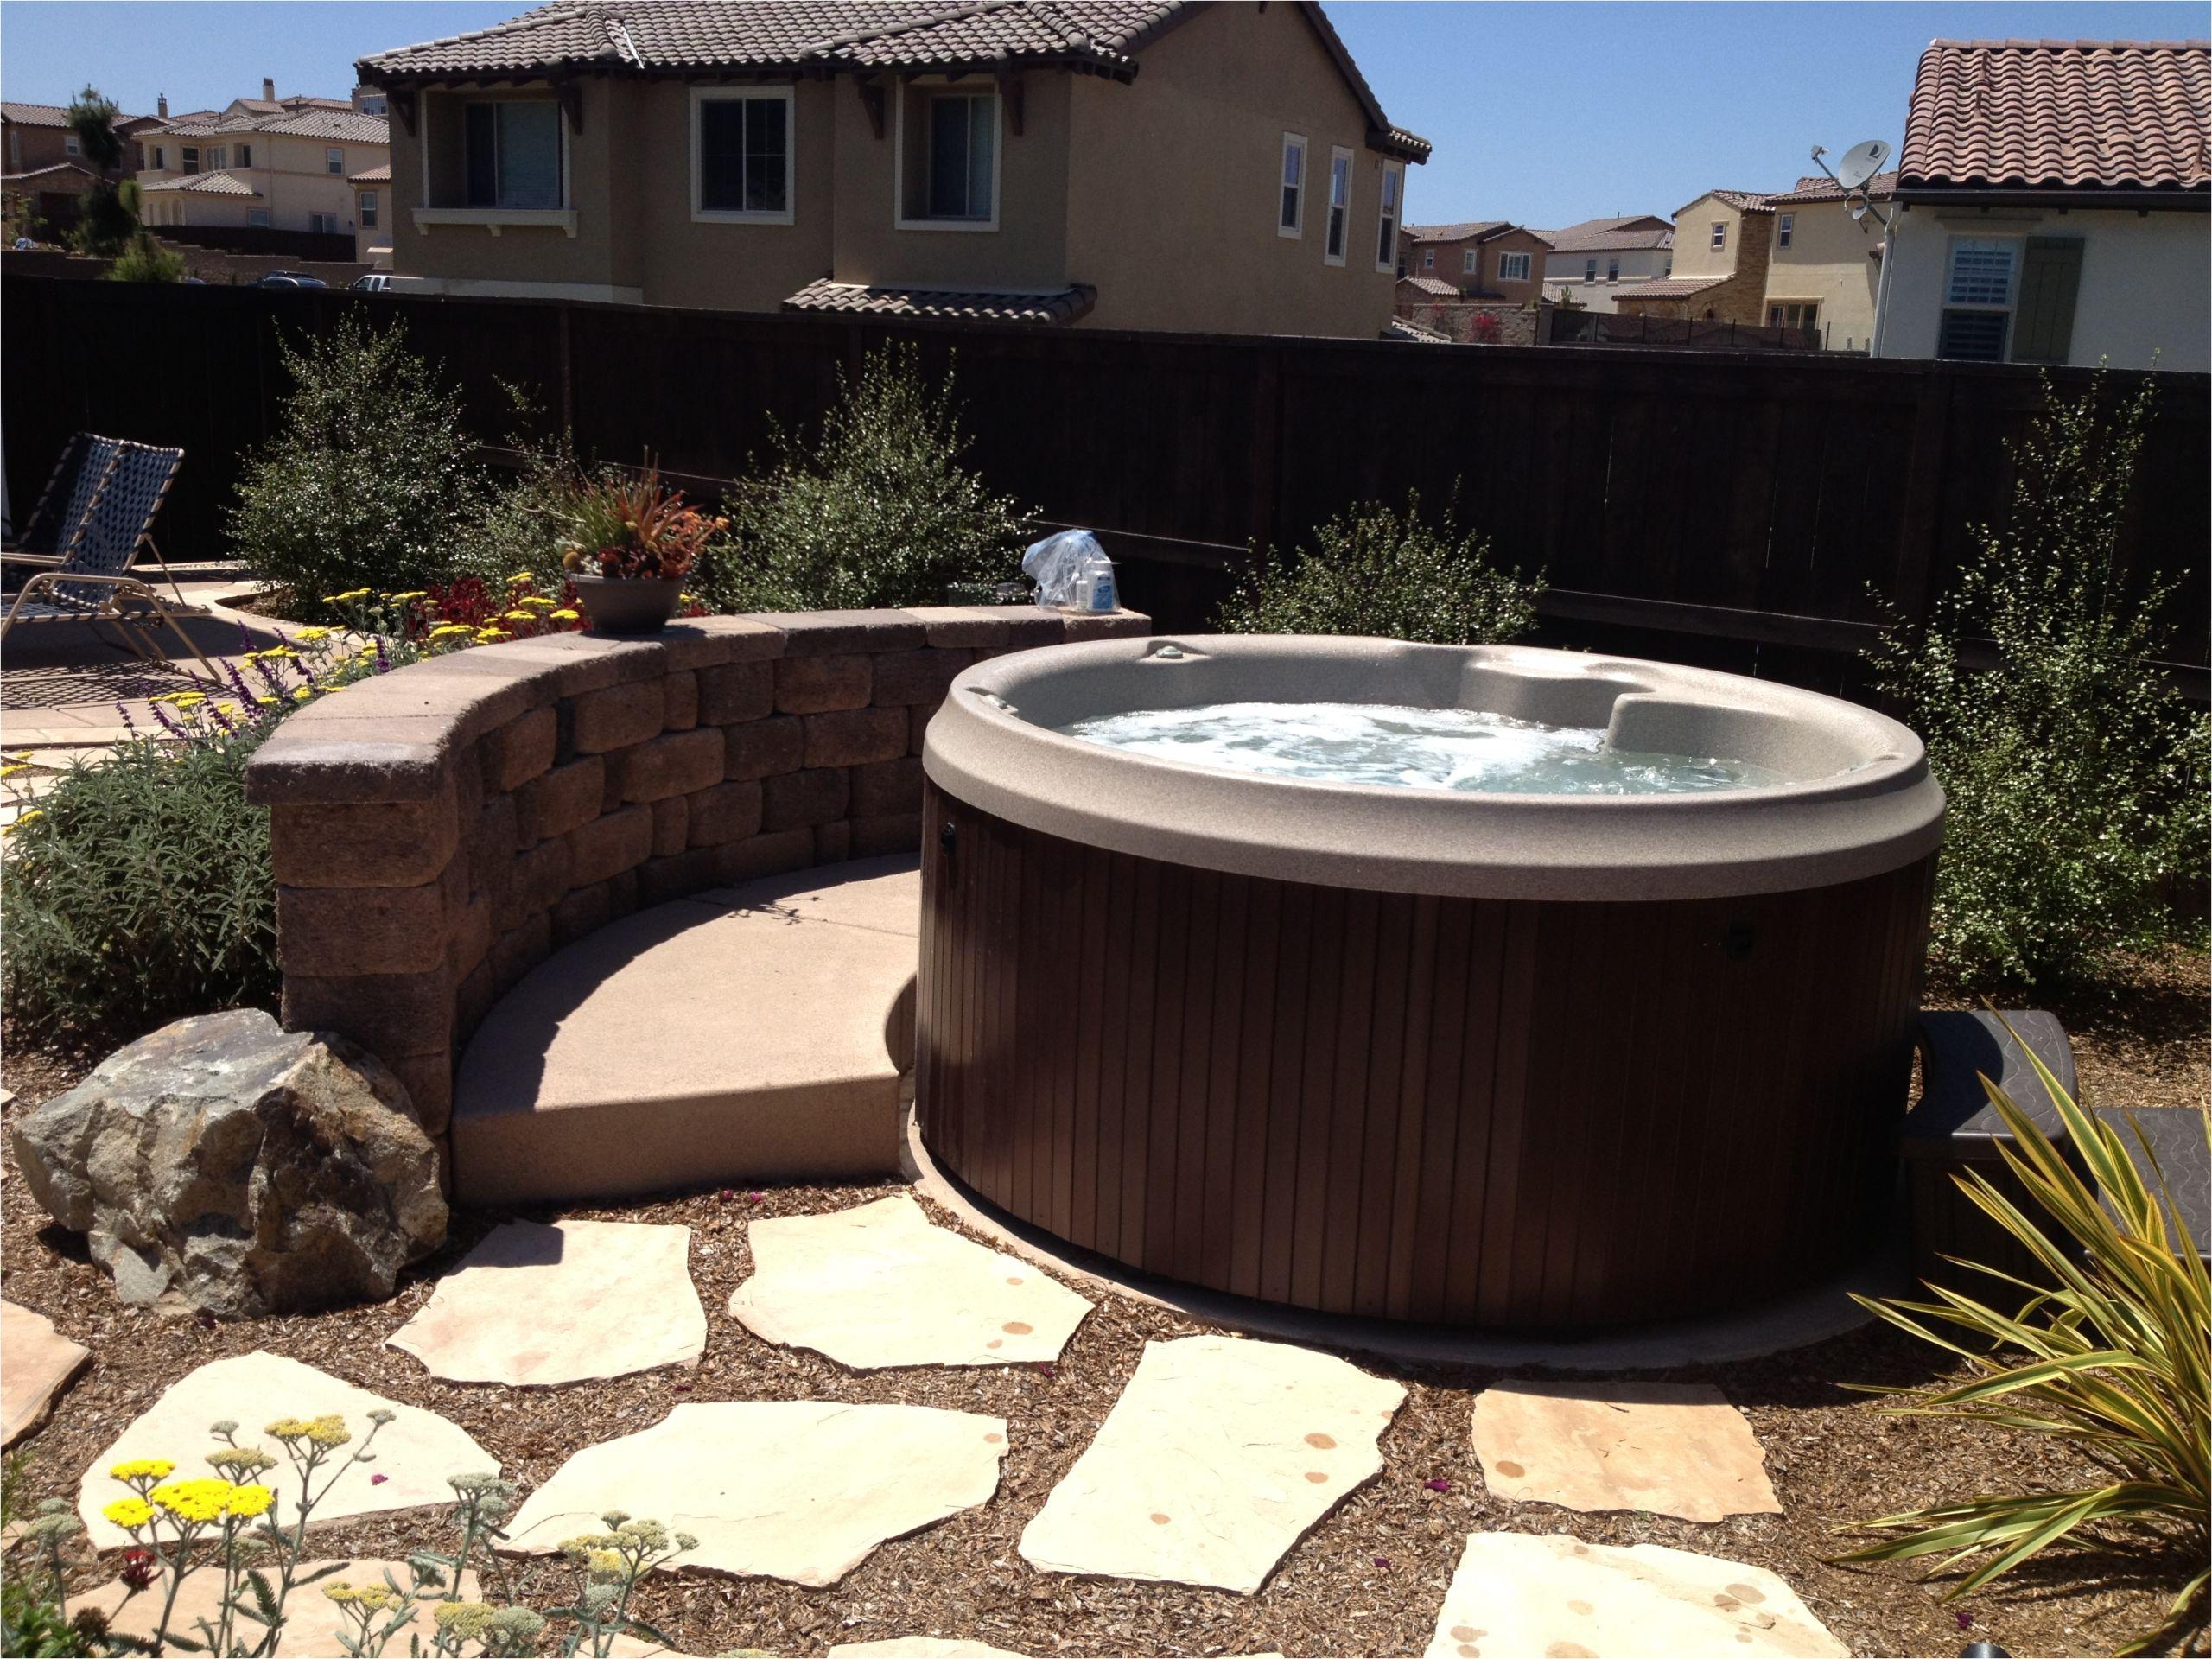 Round Jetted Bathtub Round Hot Tub From Jacuzzi at Aqua Paradise